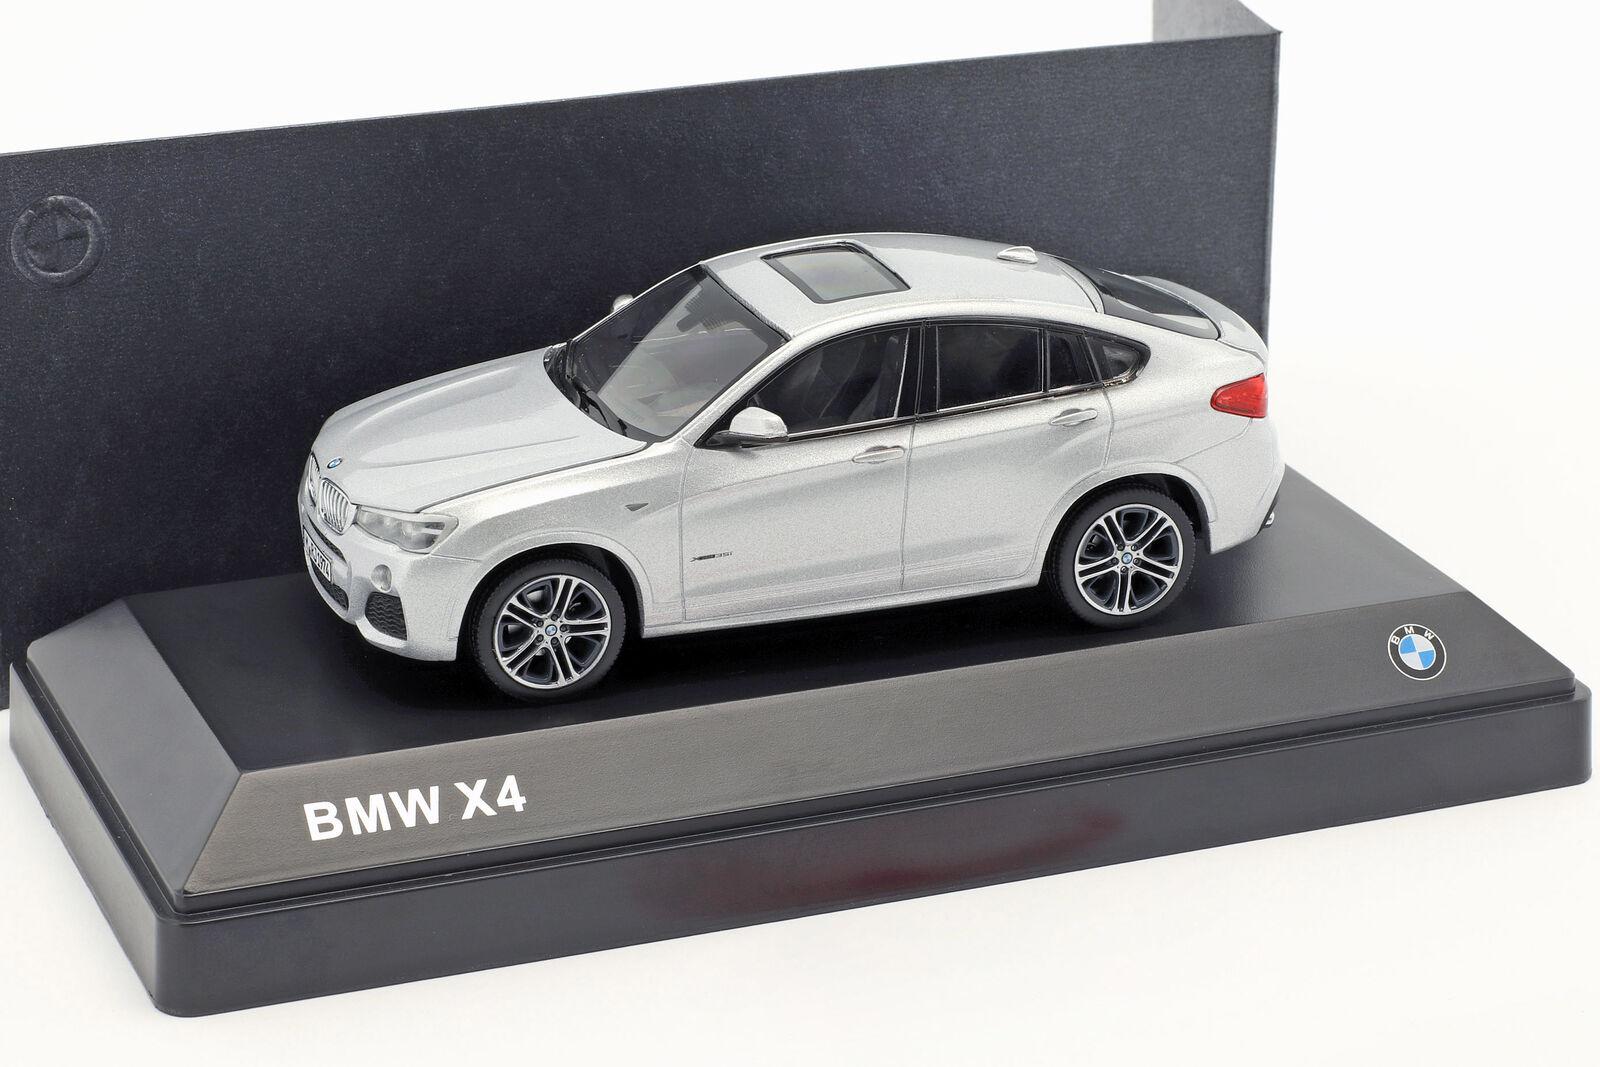 HERPA - BMW X4 (F26) СЕРЕБРЯНЫЙ 1:43